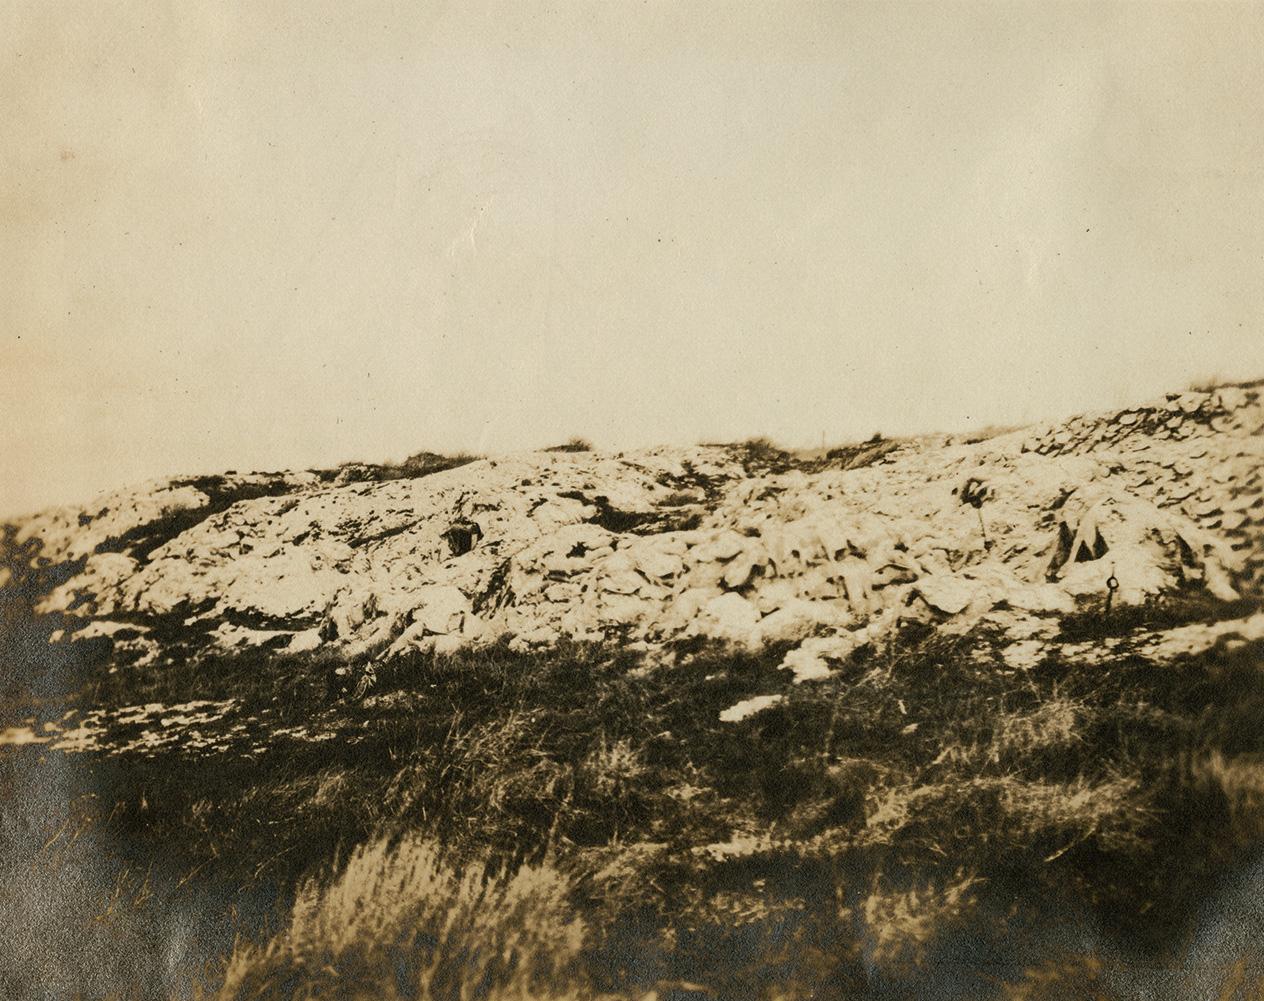 72nd Battalion Headquarters on Vimy Ridge.